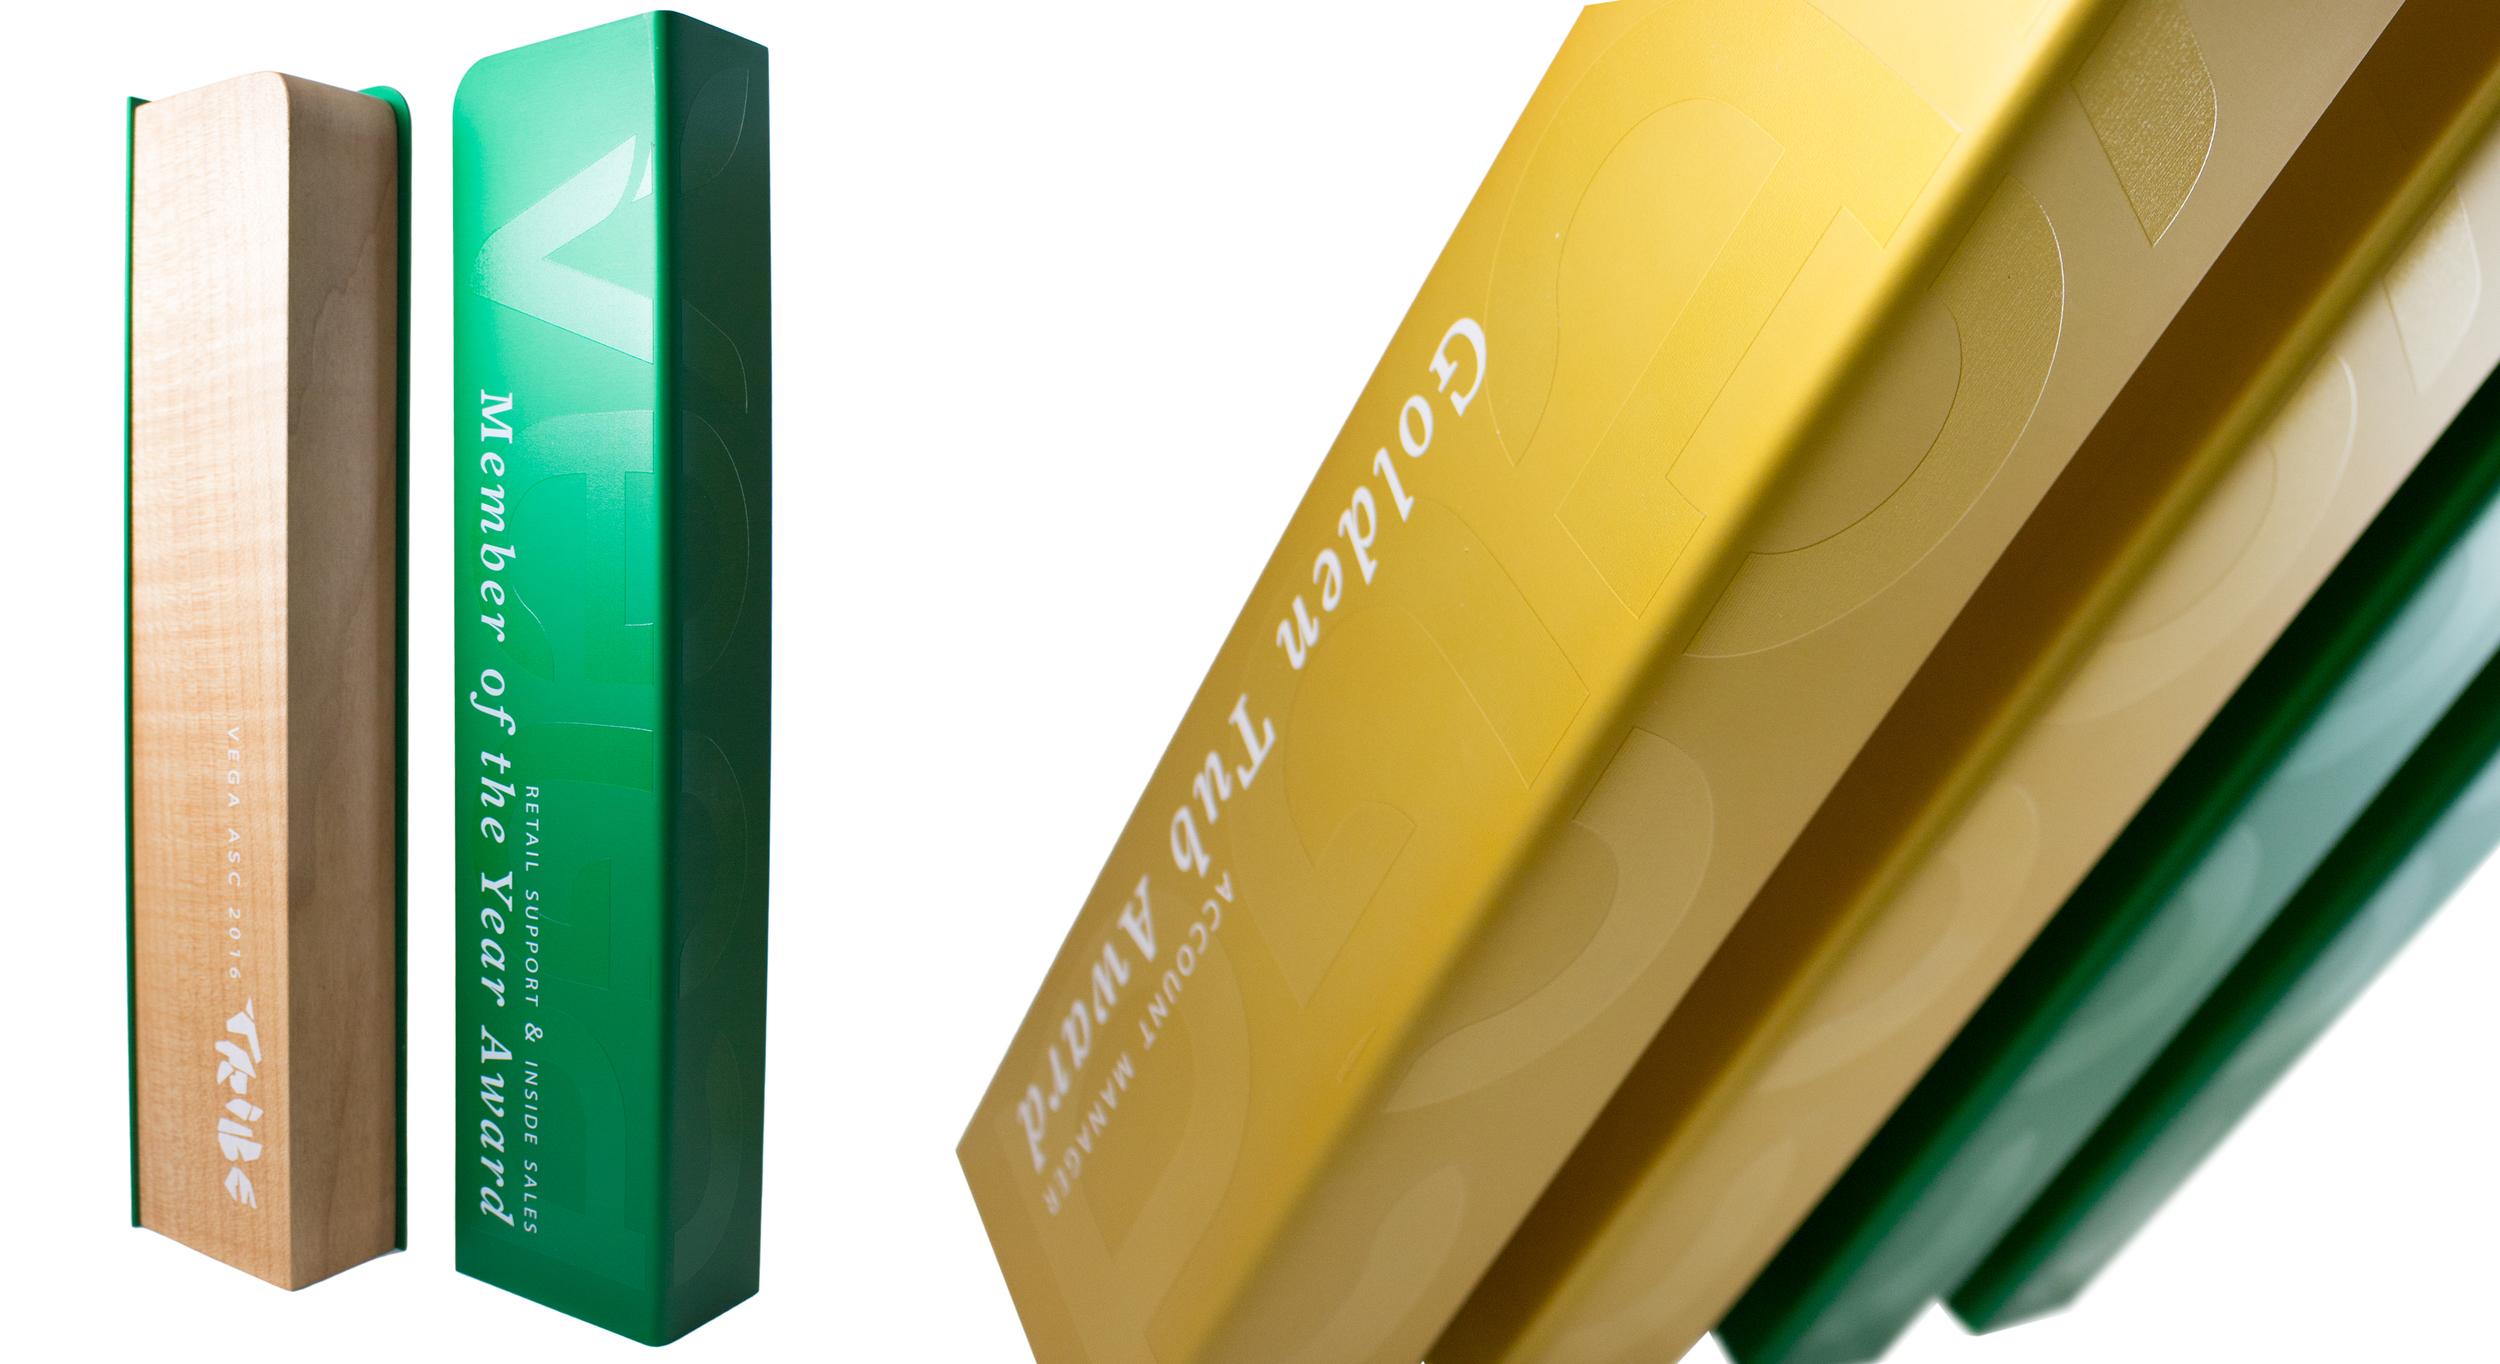 vega-awards-custom-eco-friendly